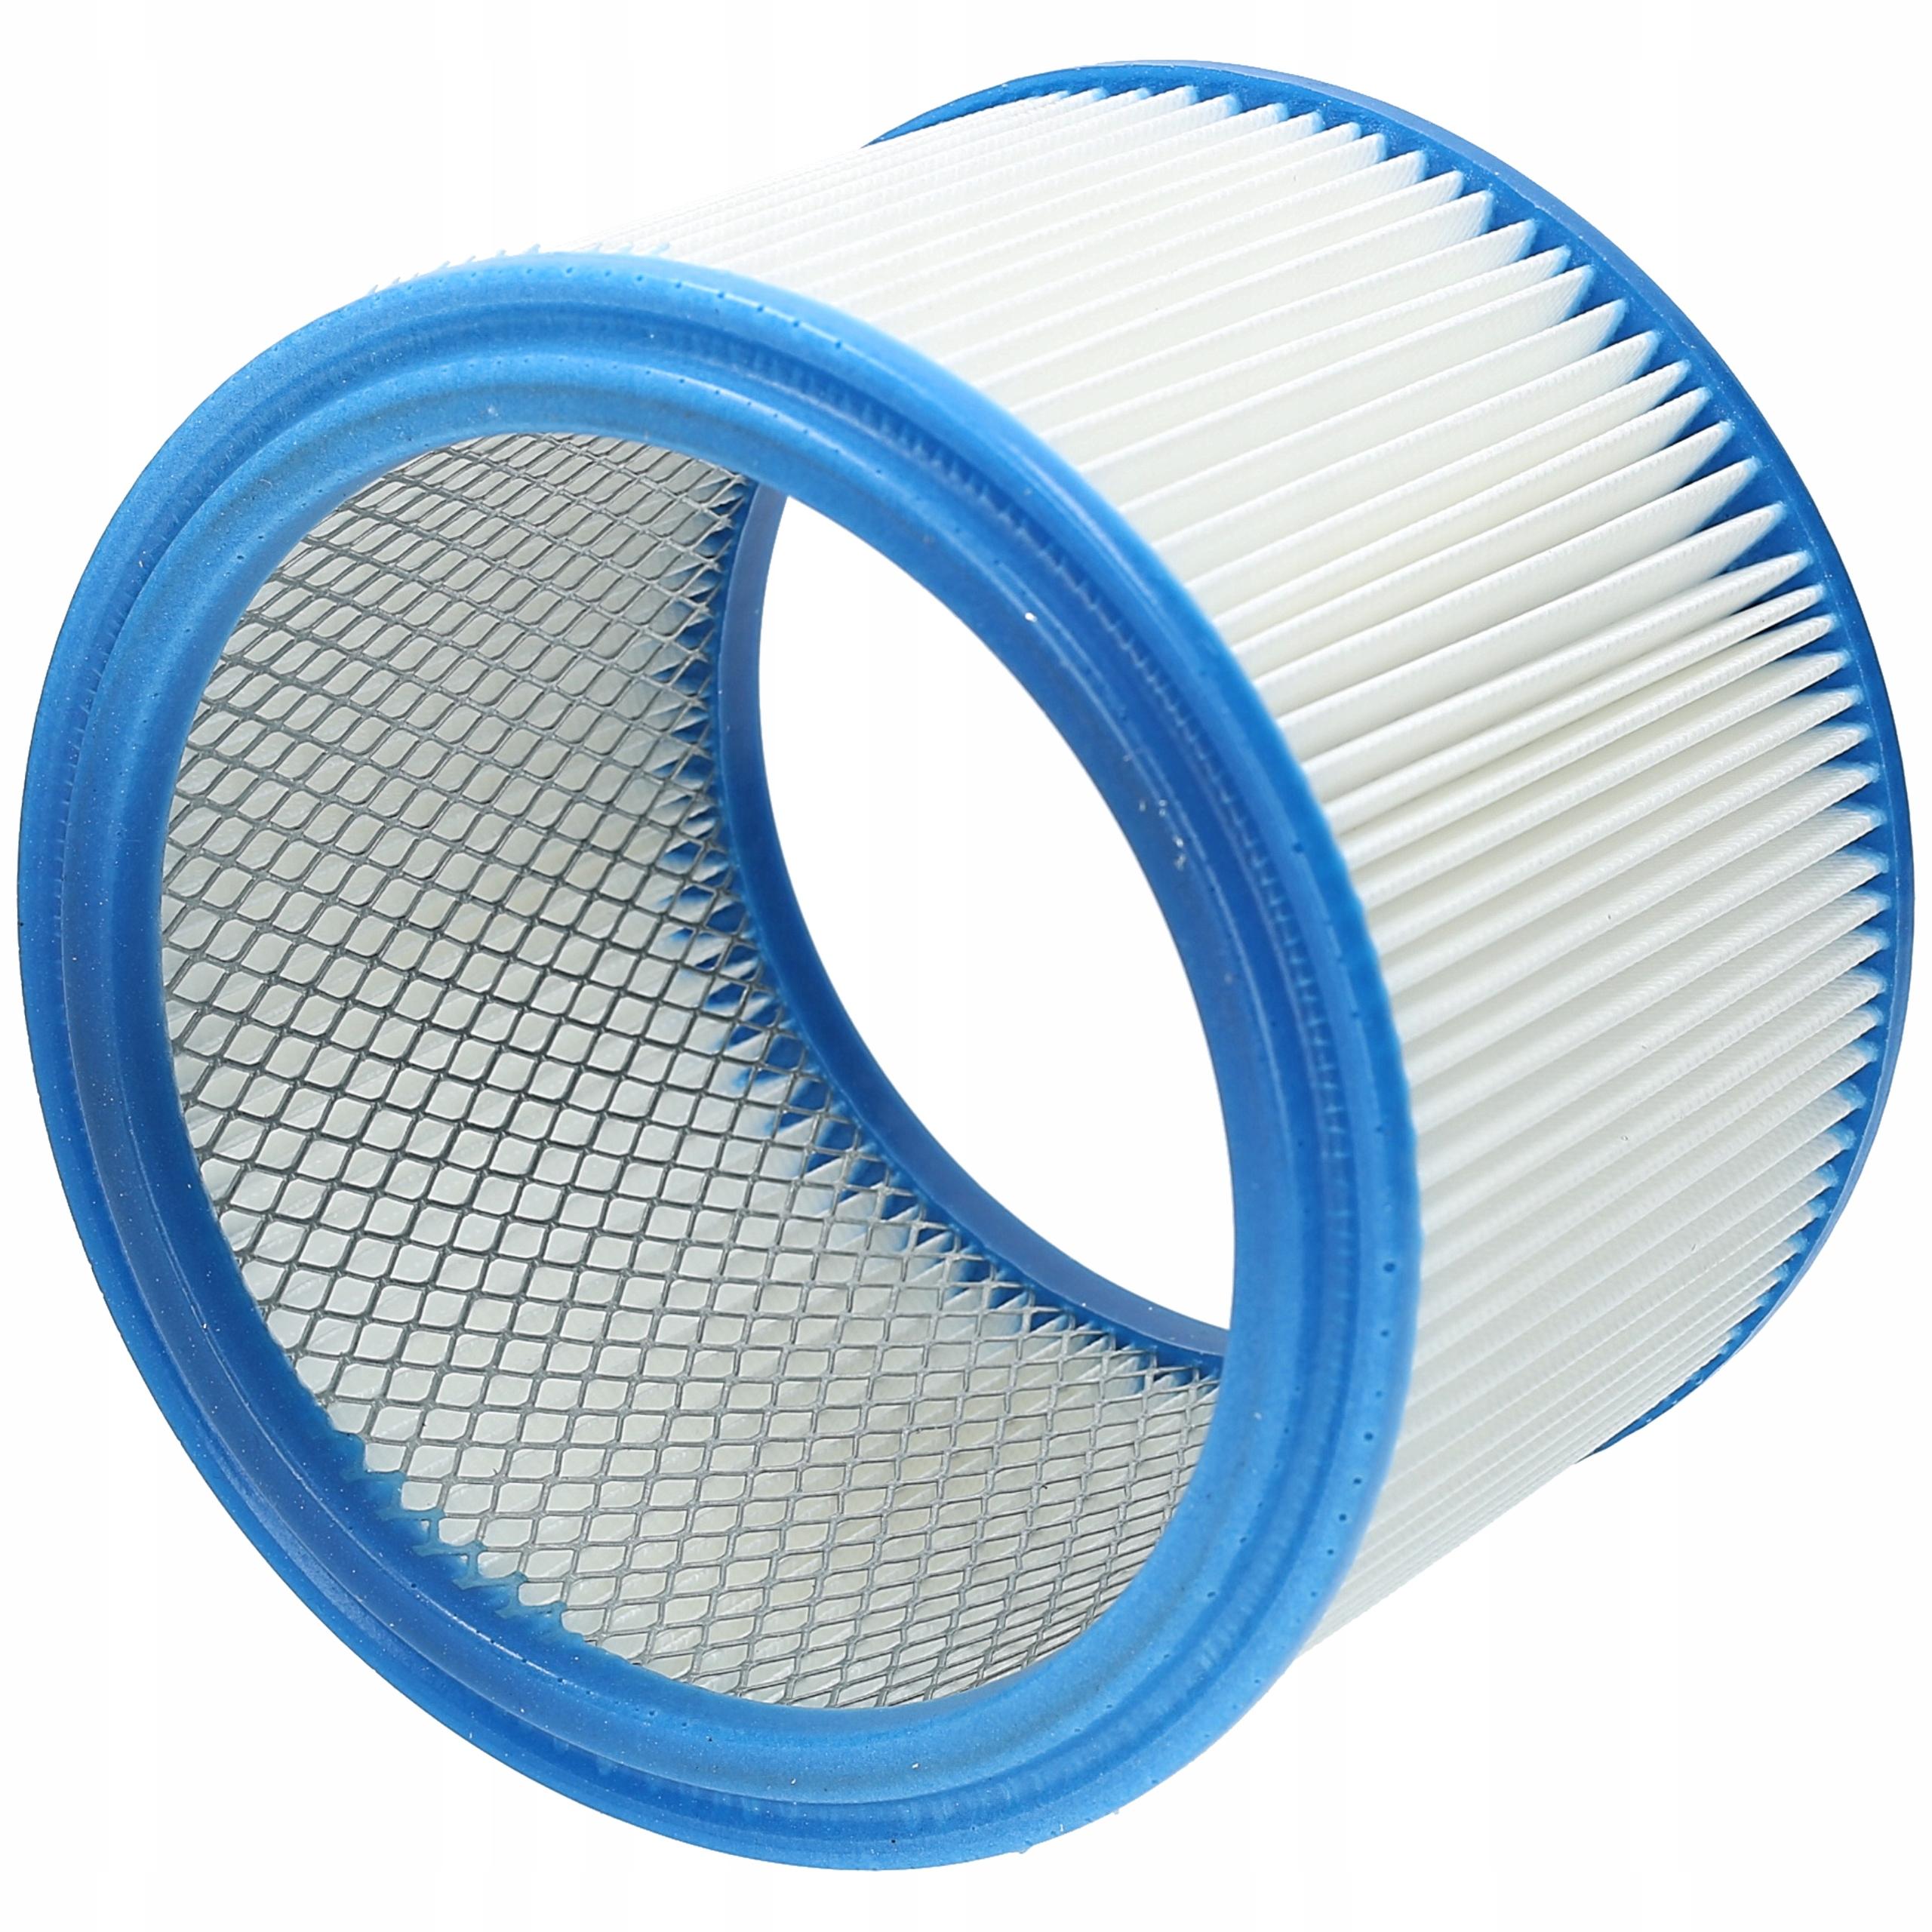 Kónický filter pre vysávač Sparky VC 1321MS